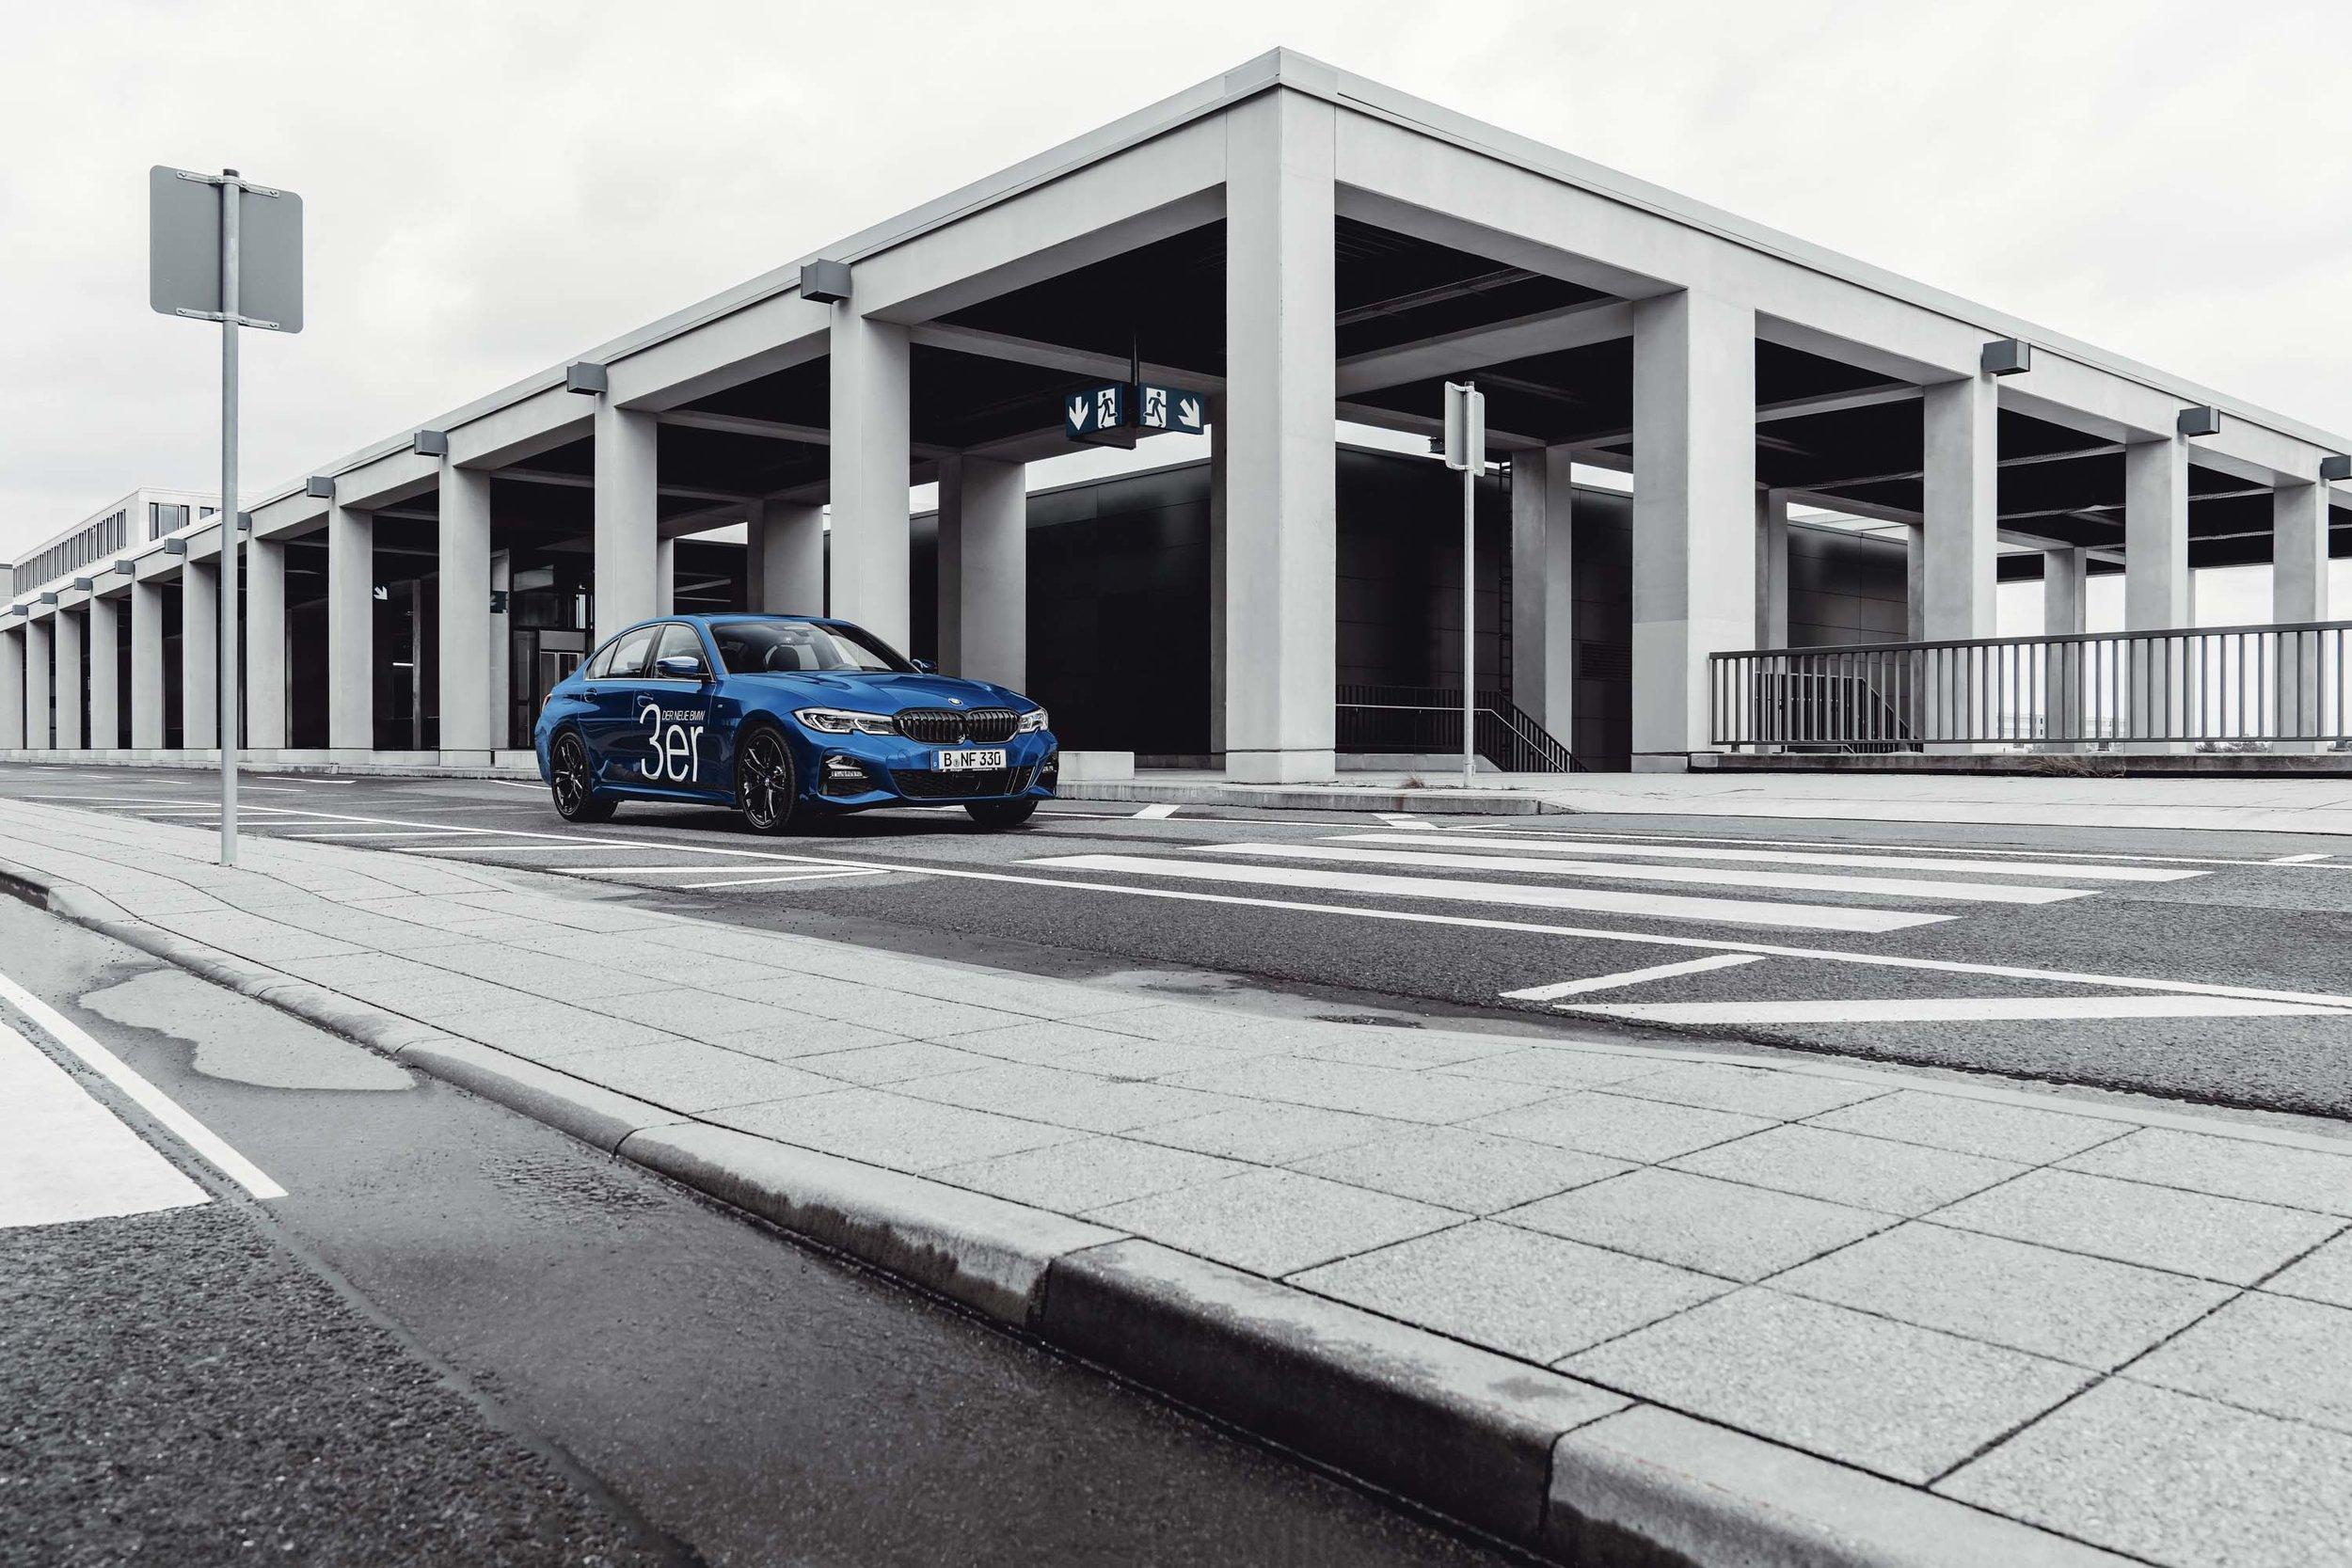 Maximilian_Otto_BMW_330i_20190414_04_WEB.jpg